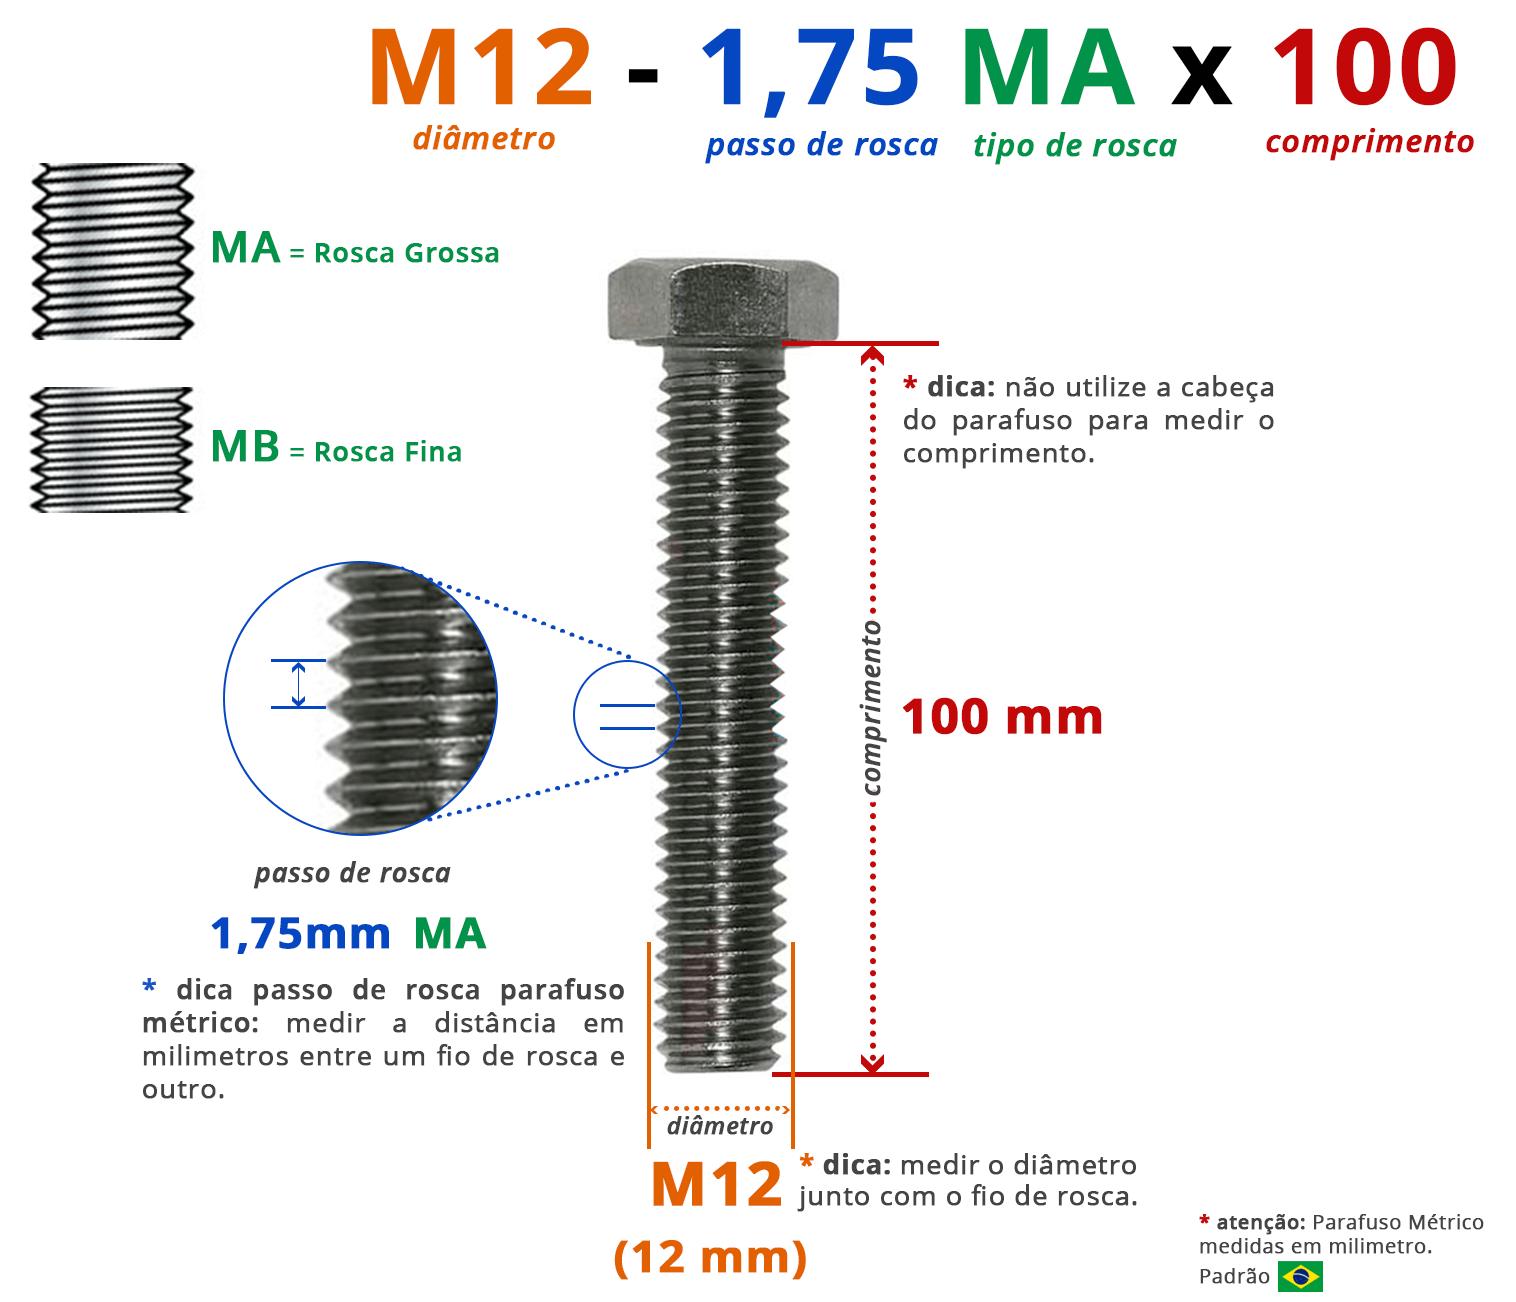 PARAFUSO SEXTAVADO ROSCA INTEIRA M12 1,75 MA X 100 DIN 933 INOX A4